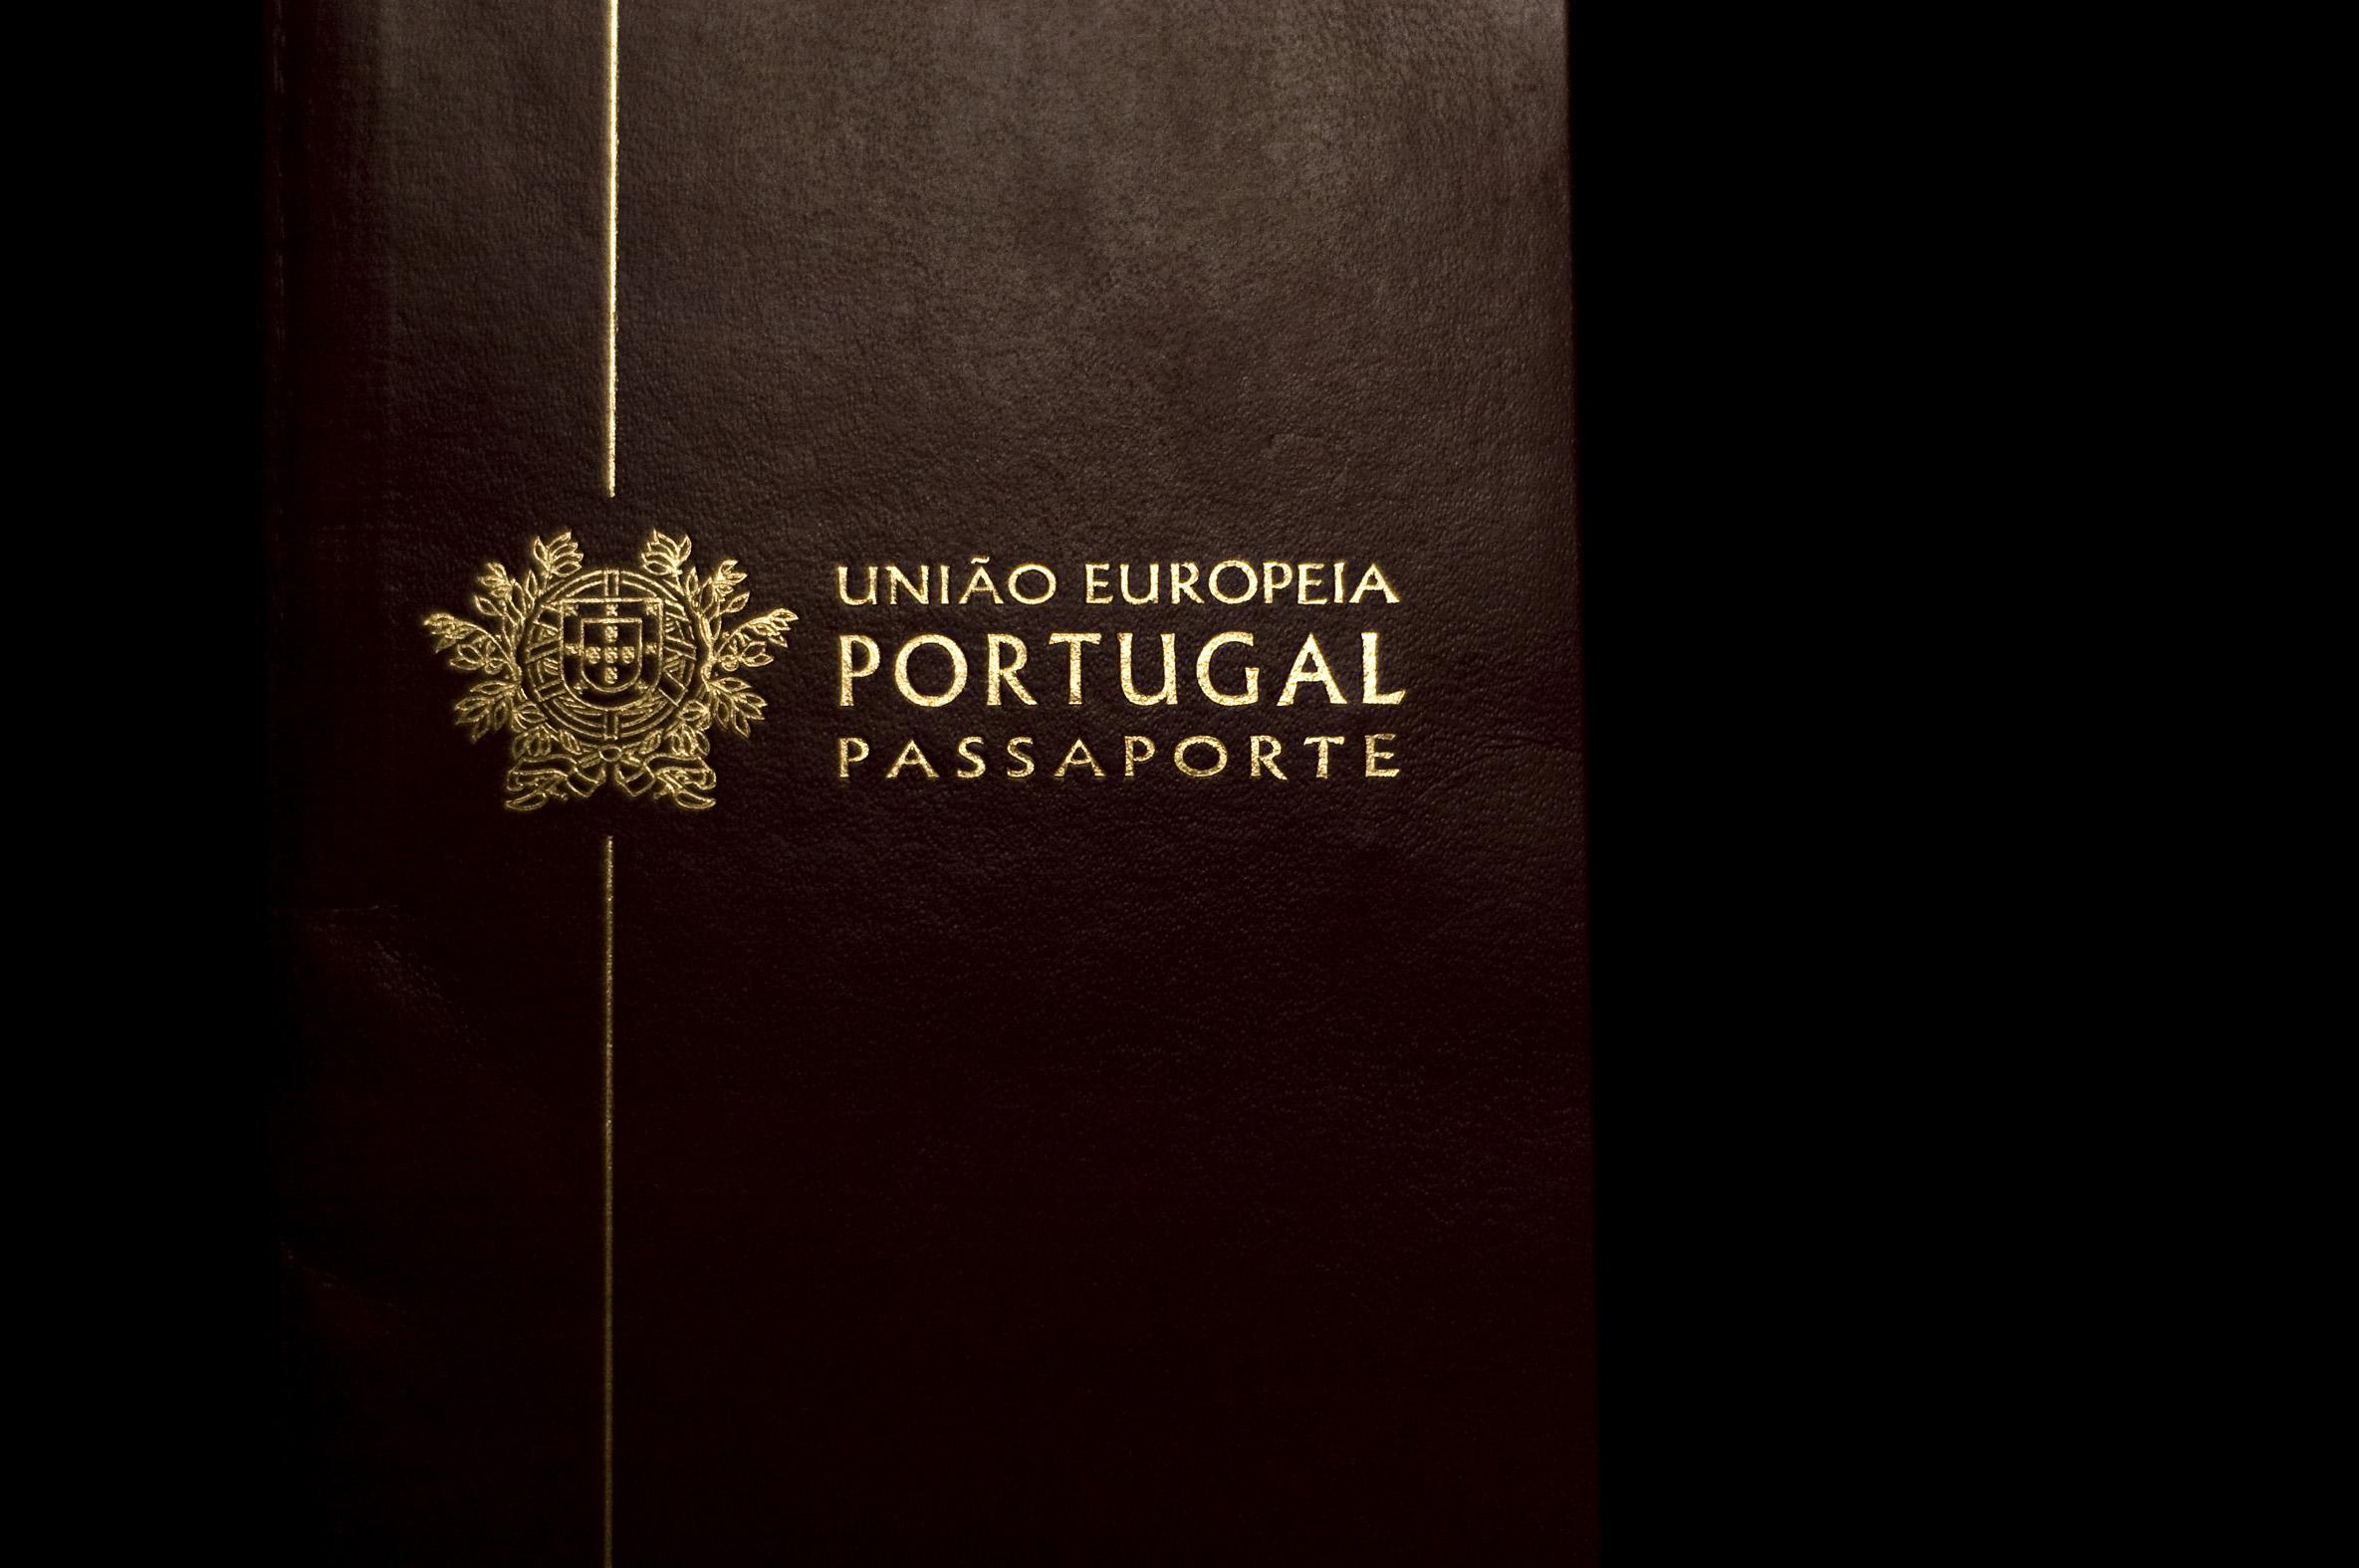 HO - 25 MARCO 2009 - Passaporte PORTUGUES - PASSAPORTES UNIAO EUROPEIA EUROPA